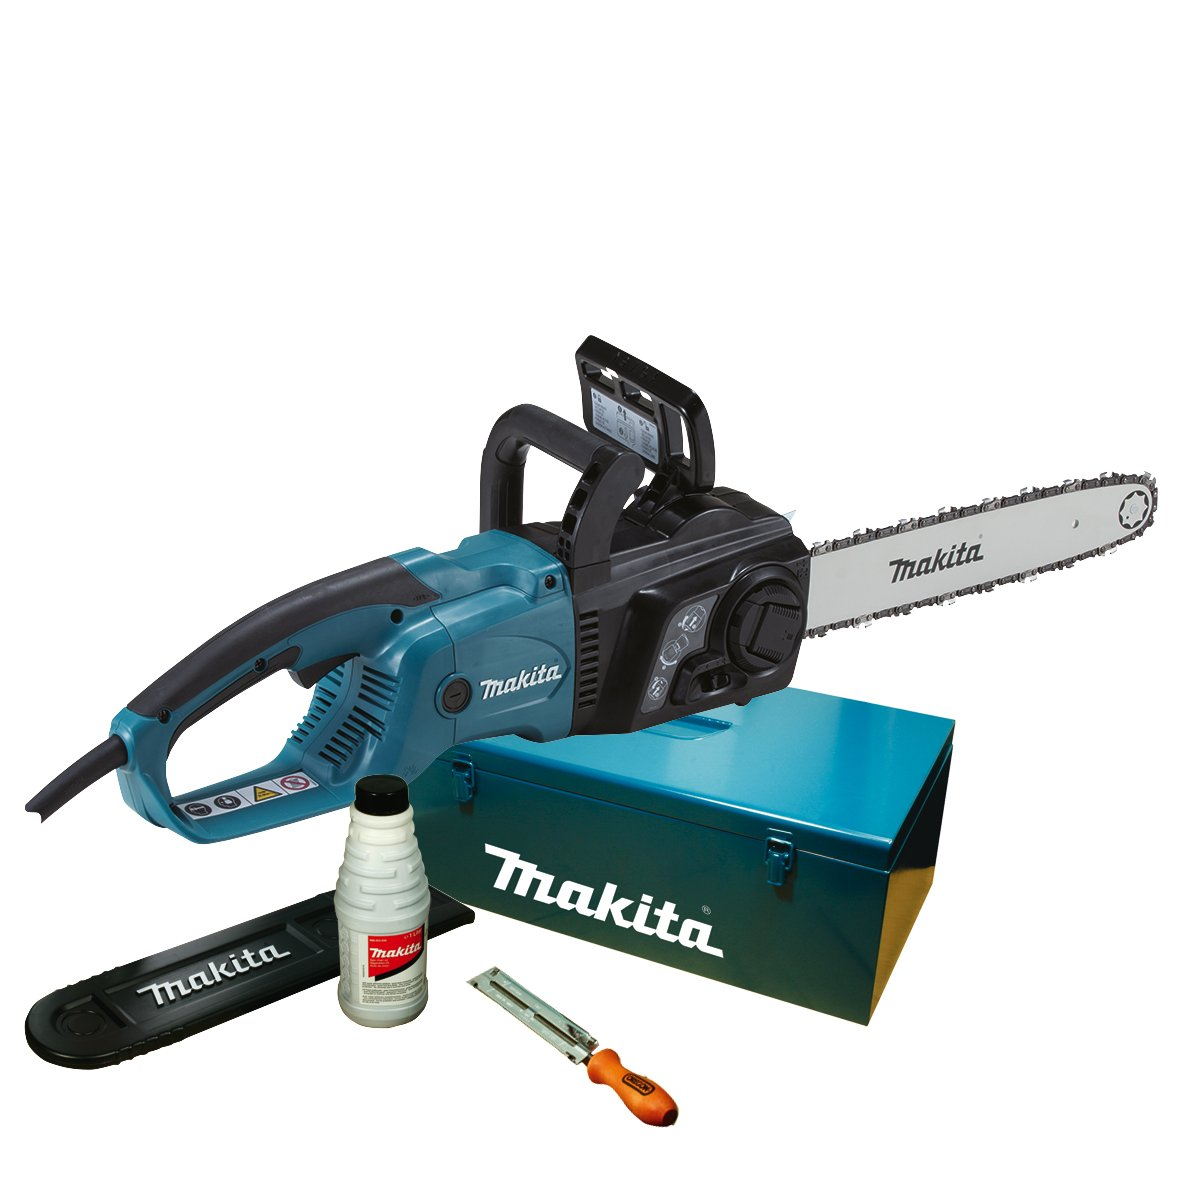 Makita UC4051AK 2200W power chainsaw - power chainsaws (76.2 / 8 mm (3 / 8), Black, Blue)